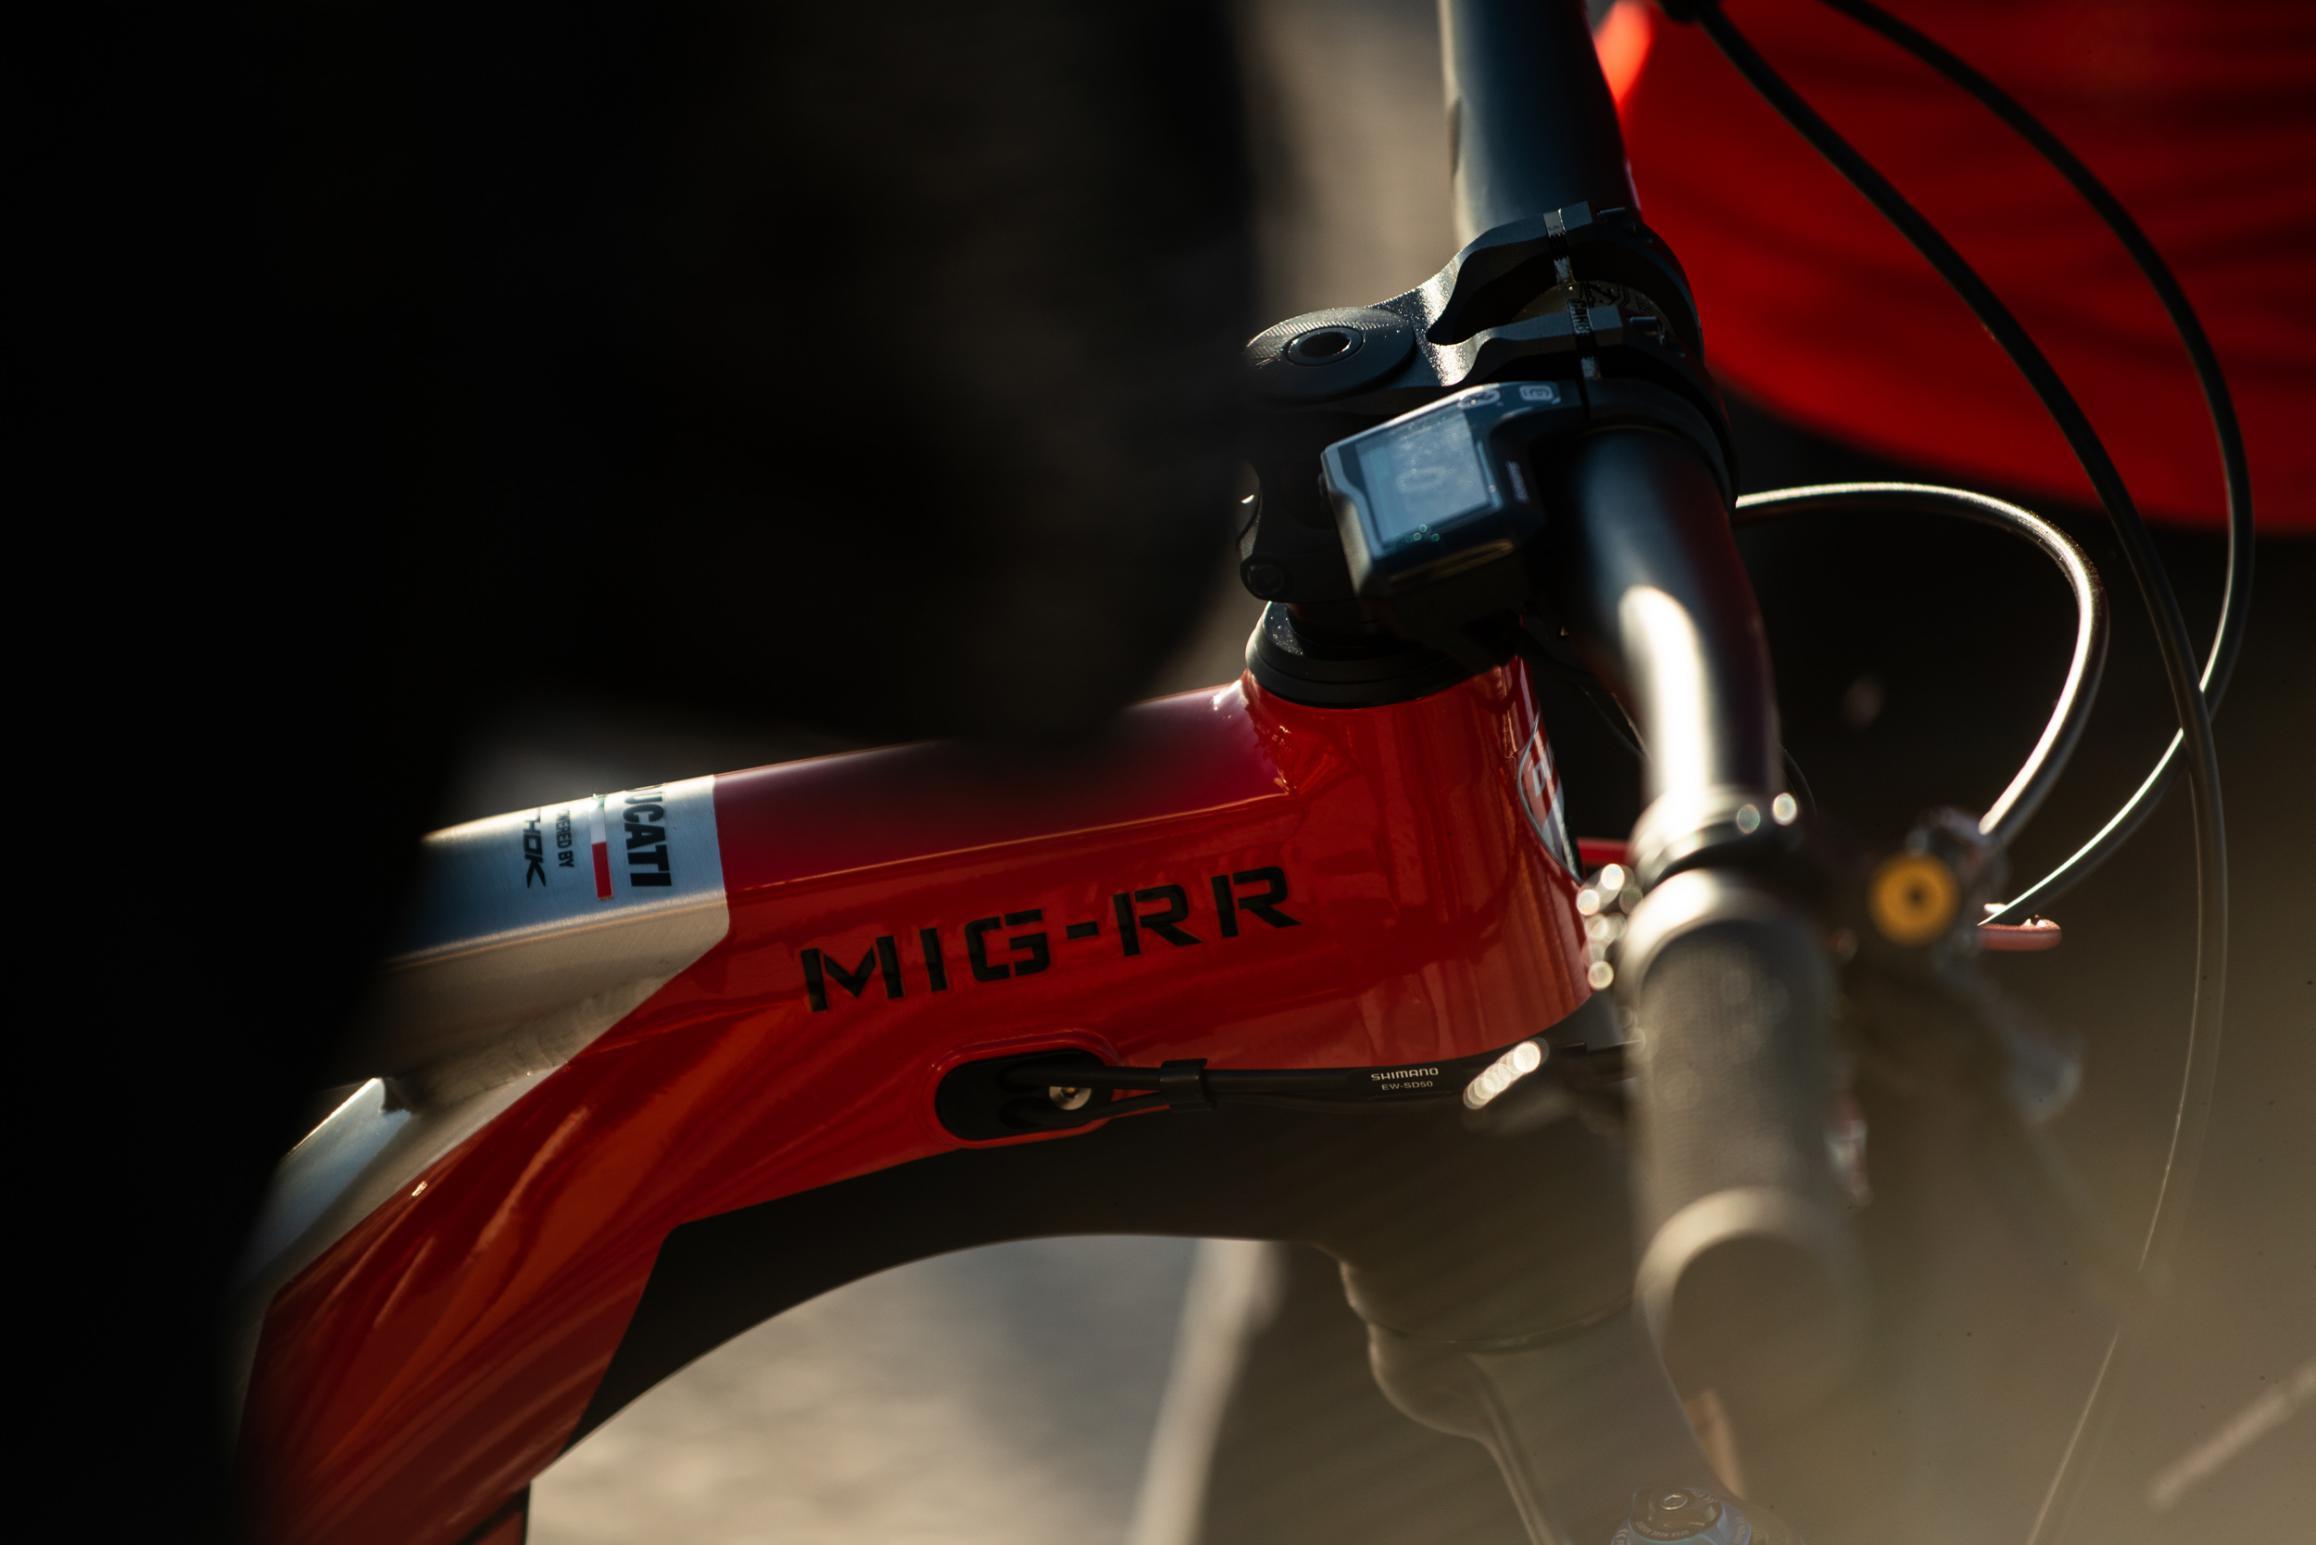 Ducati MIG-RR